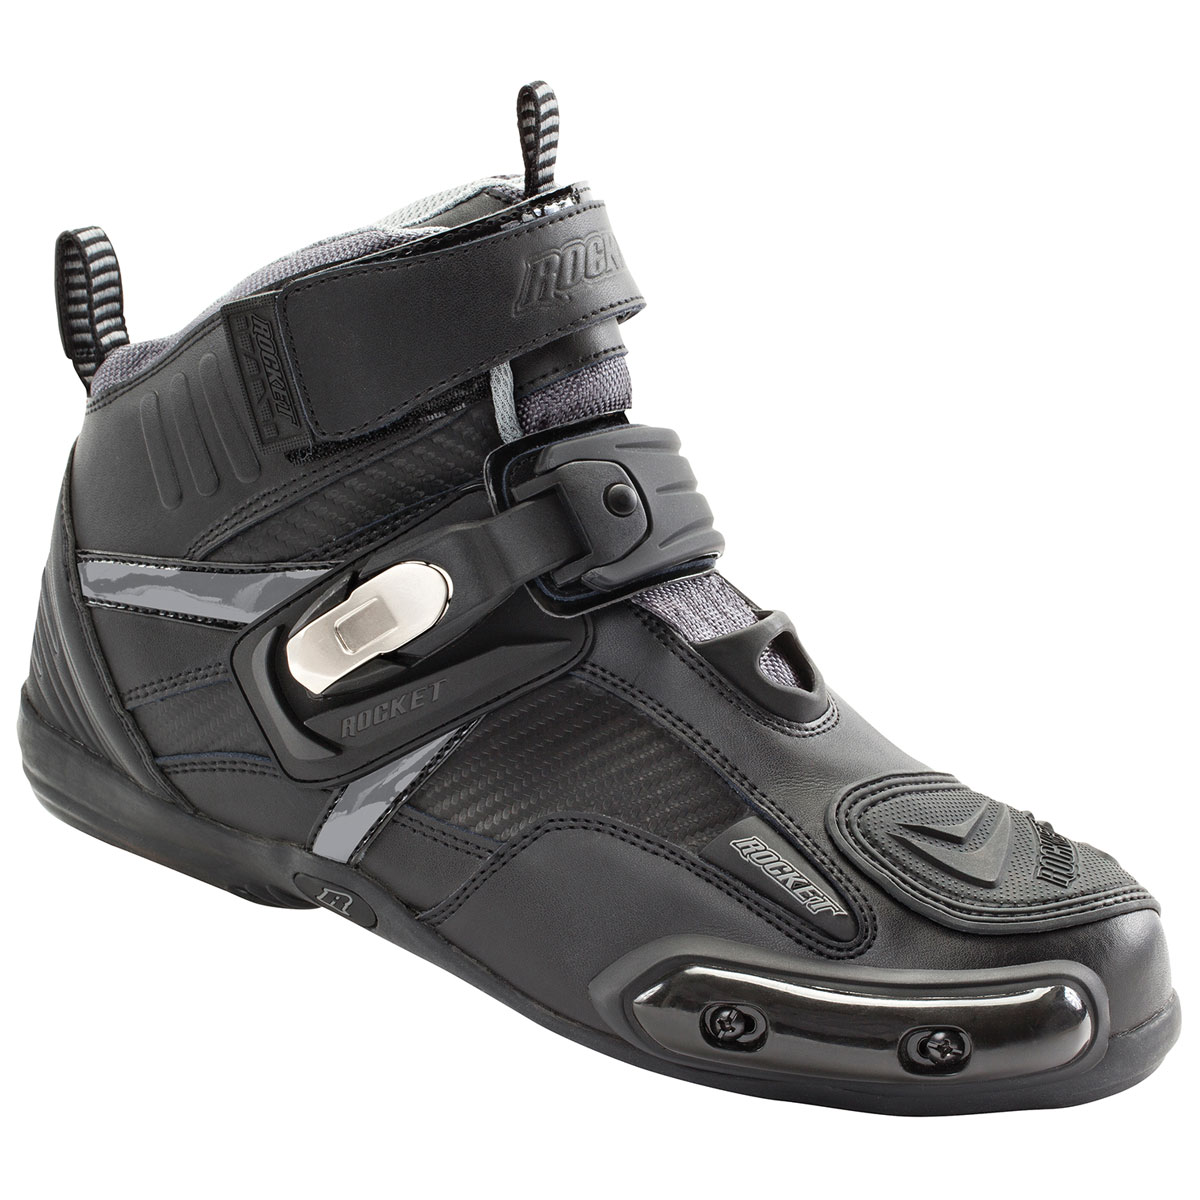 Joe Rocket Men's Atomic Black/Gray Boots